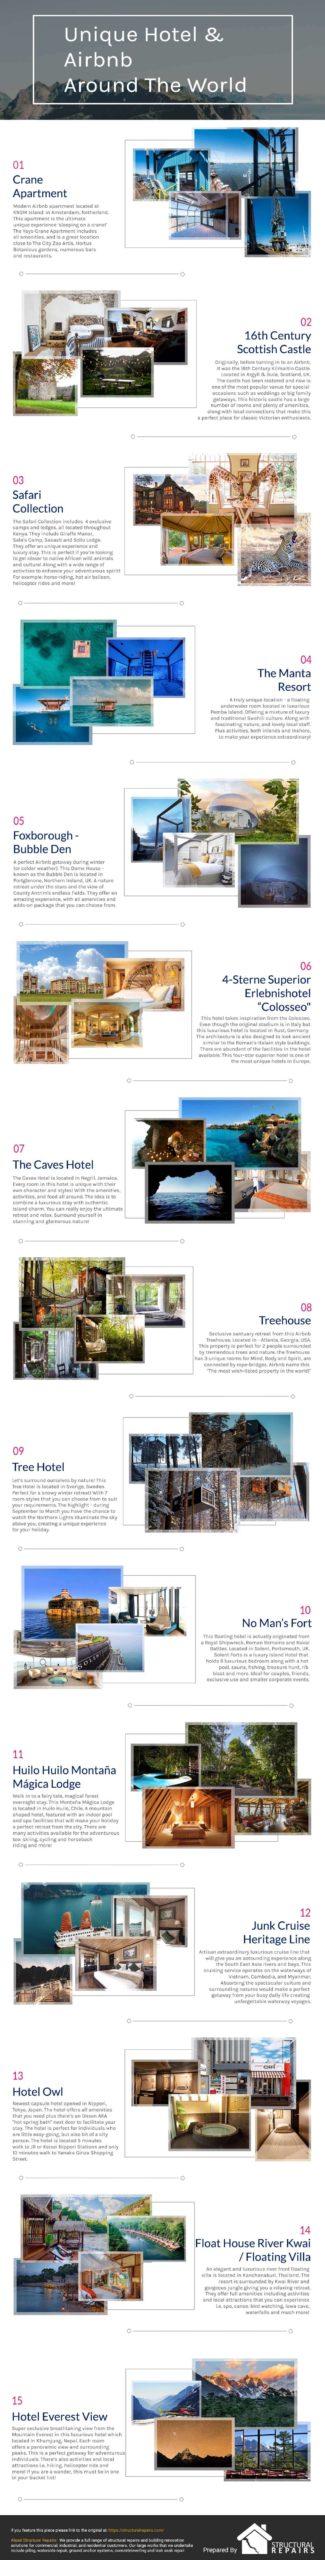 Unique Hotels & Airbnb